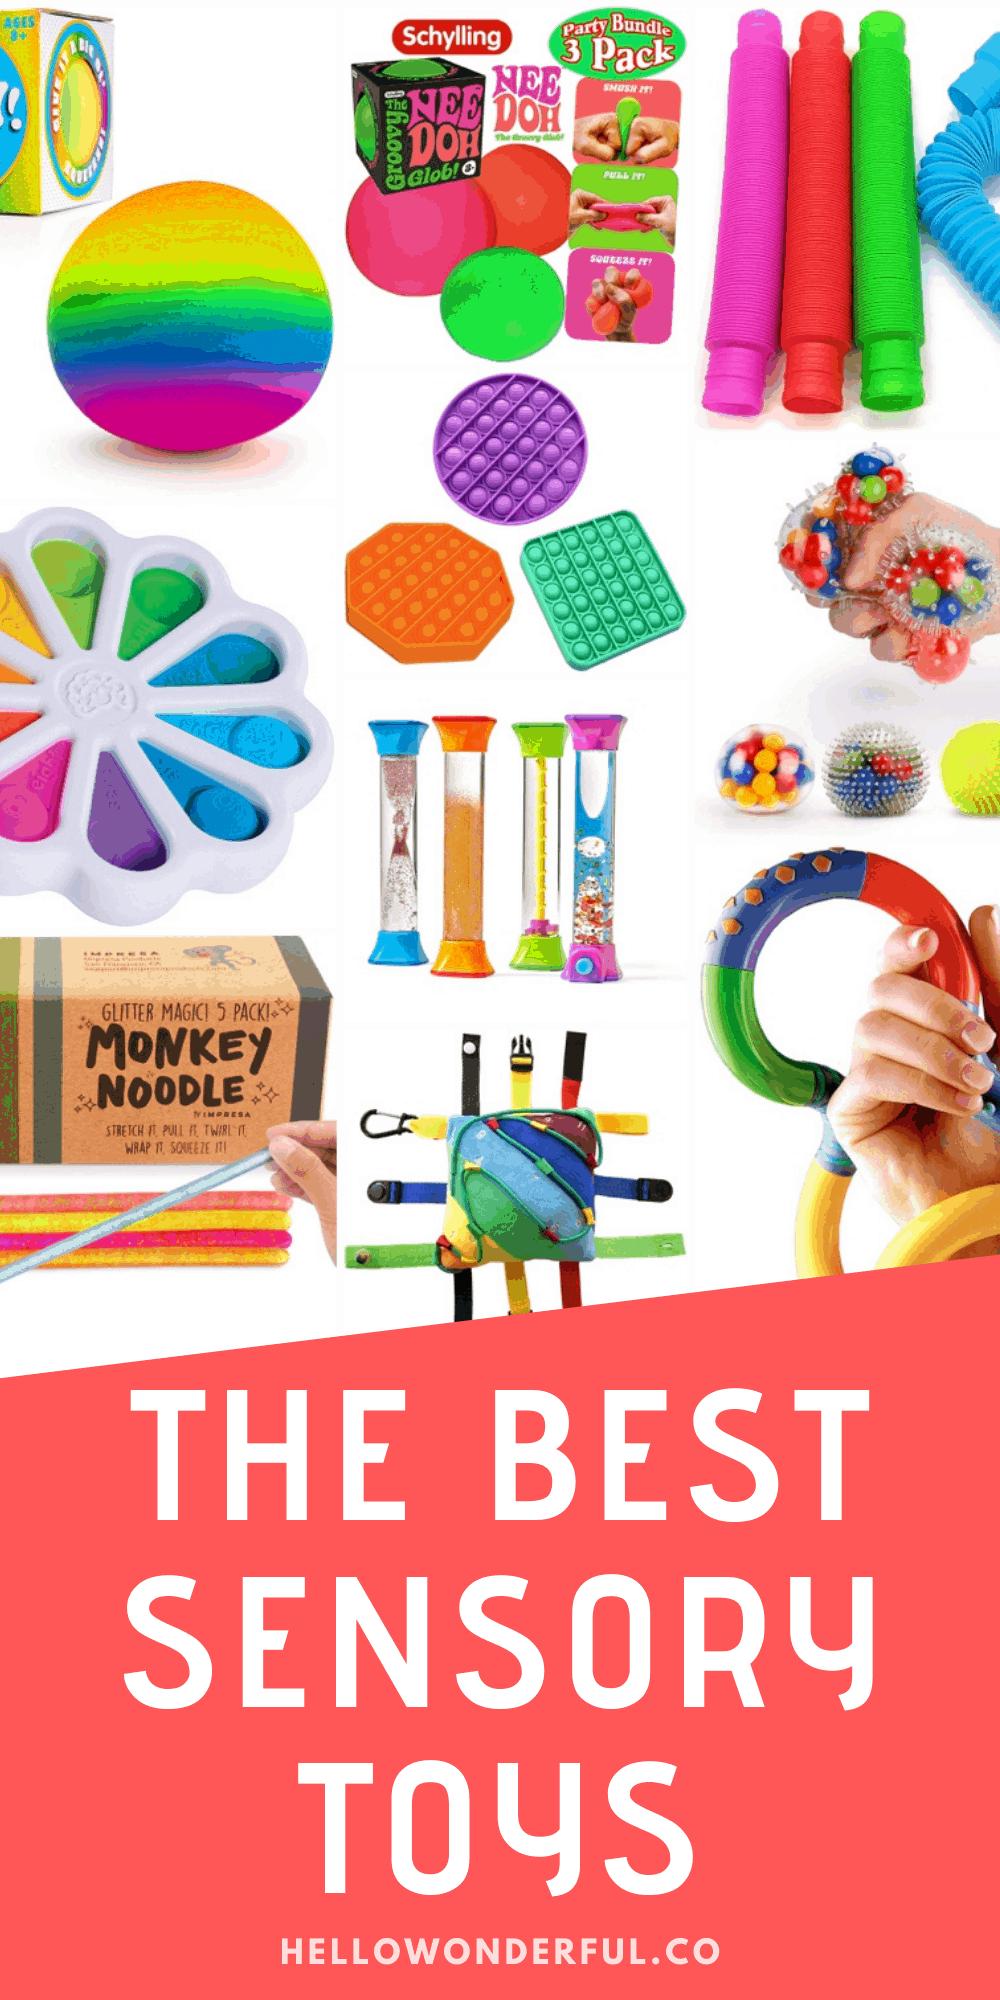 the best sensory toys for kids 2021